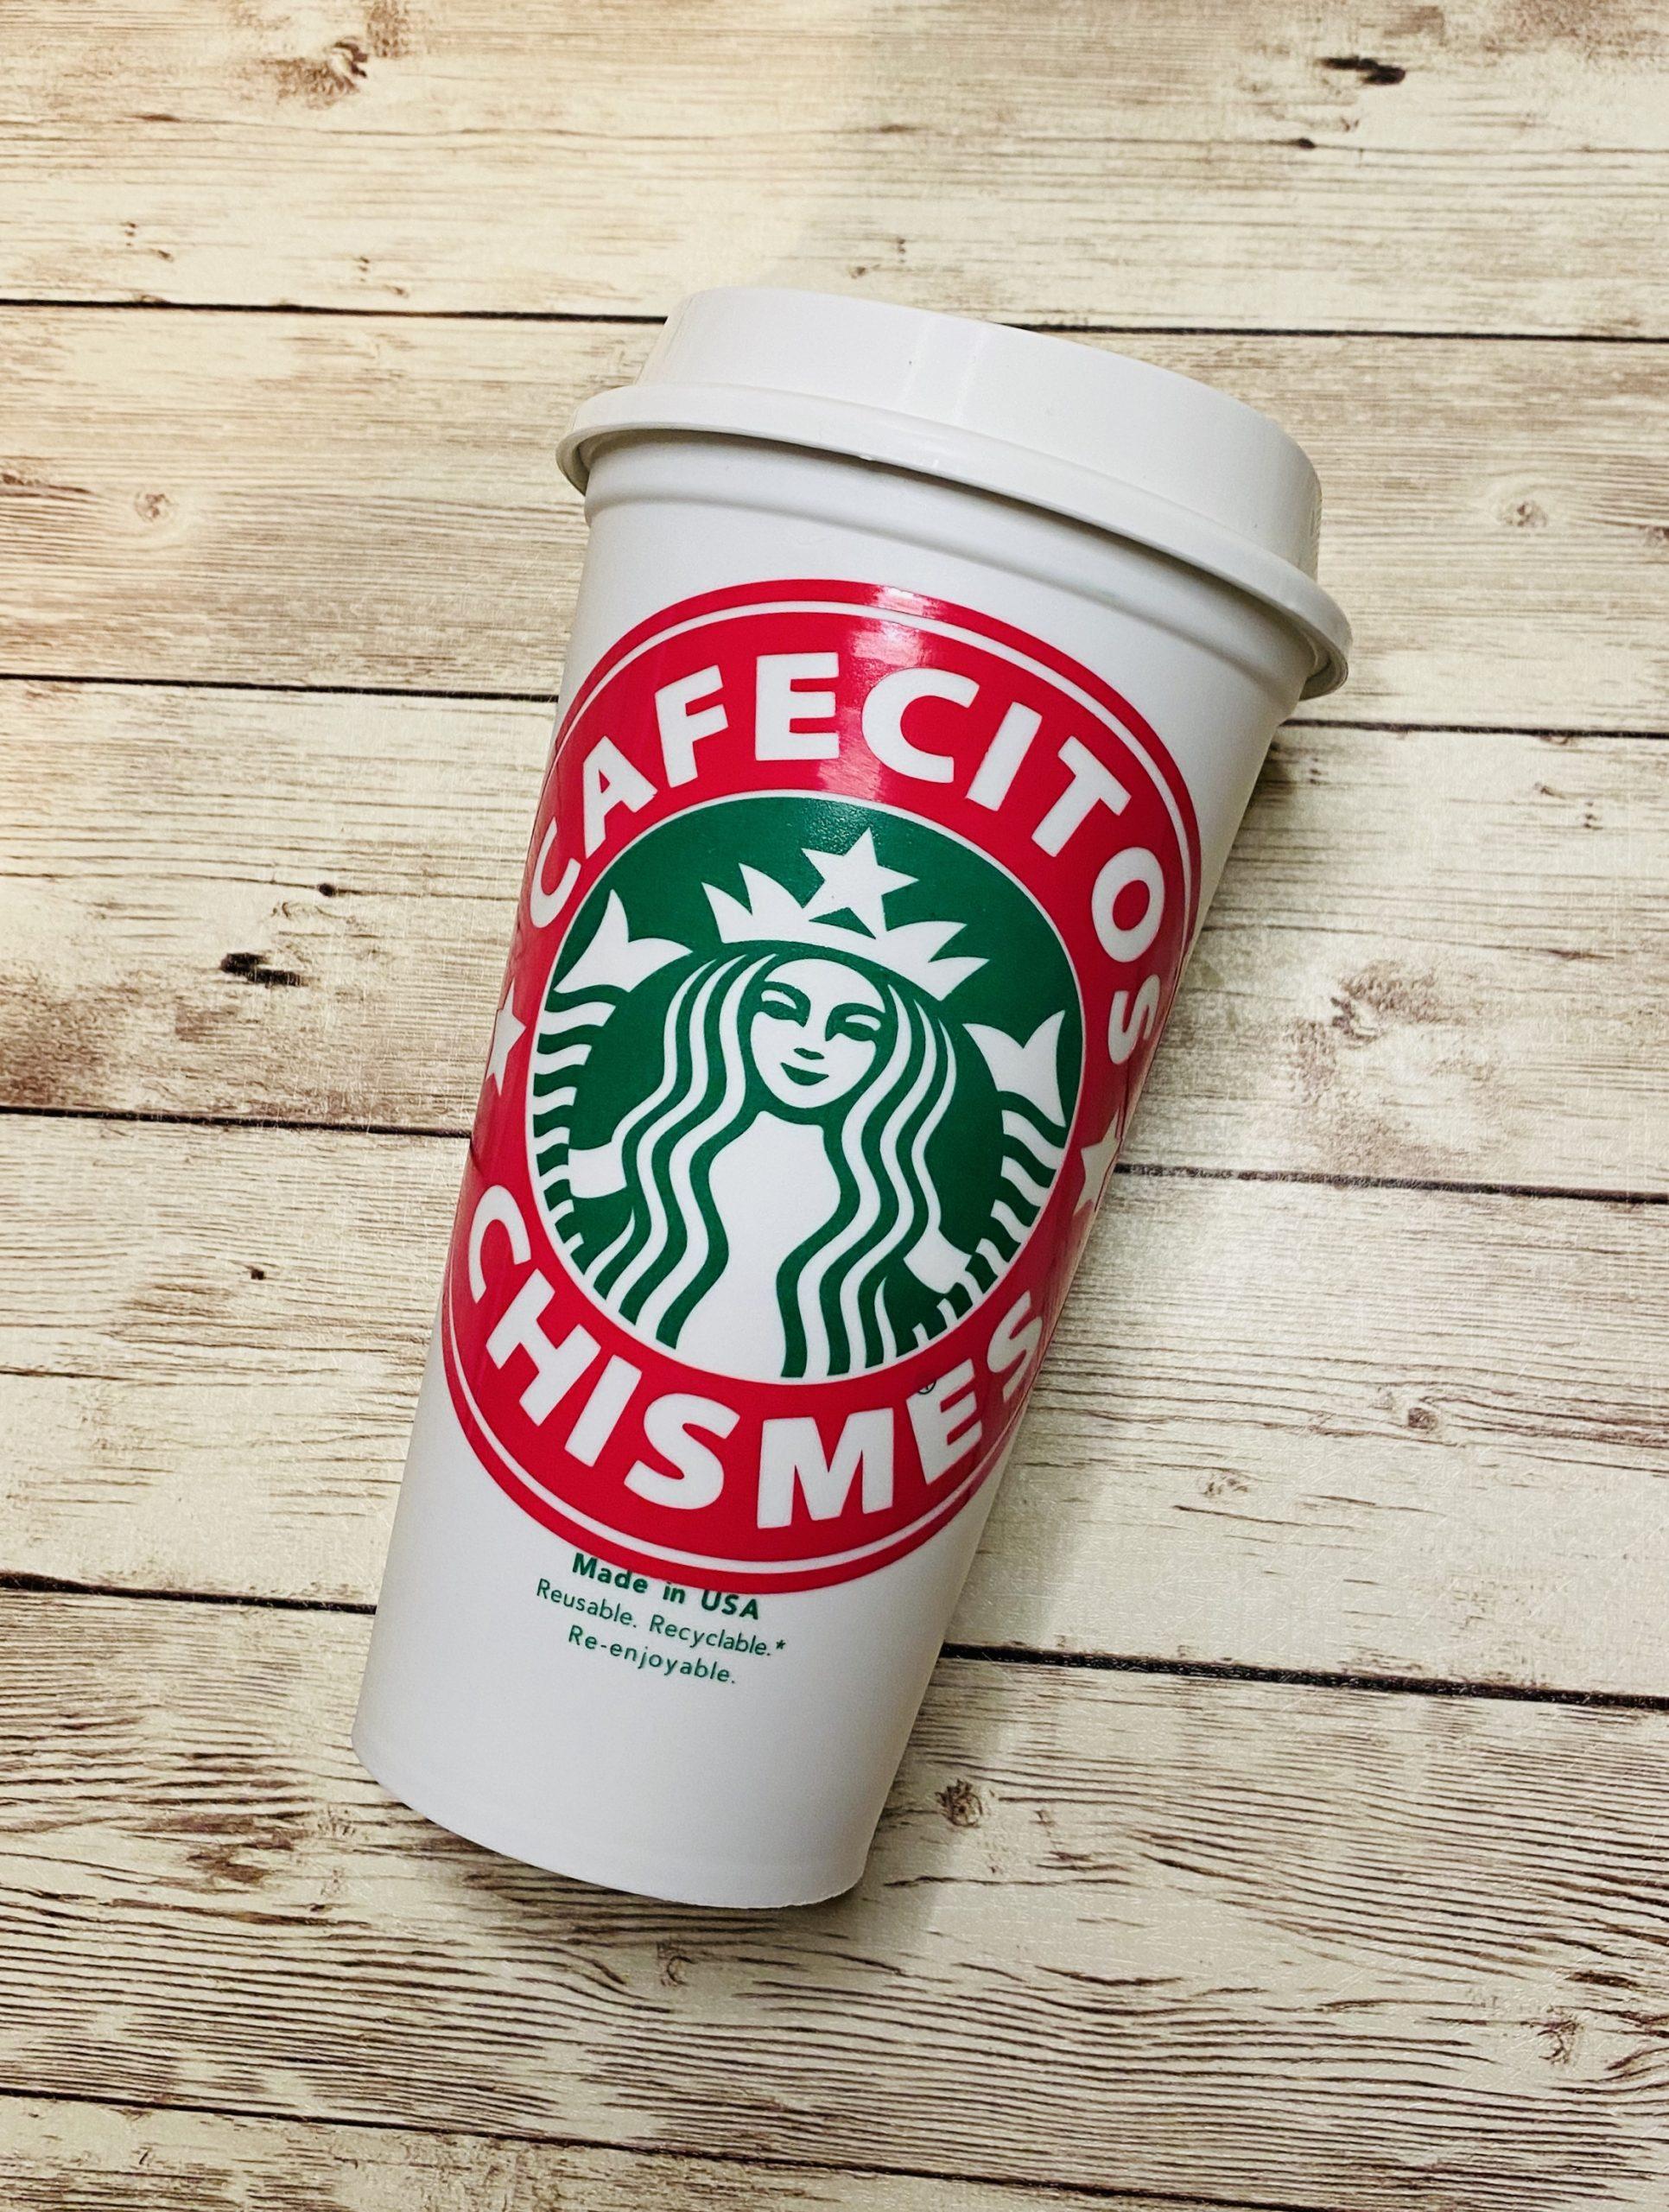 Cafecito At Starbucks Free Svg Cafecito En Starbucks Svg Gratis Cheeky Minds